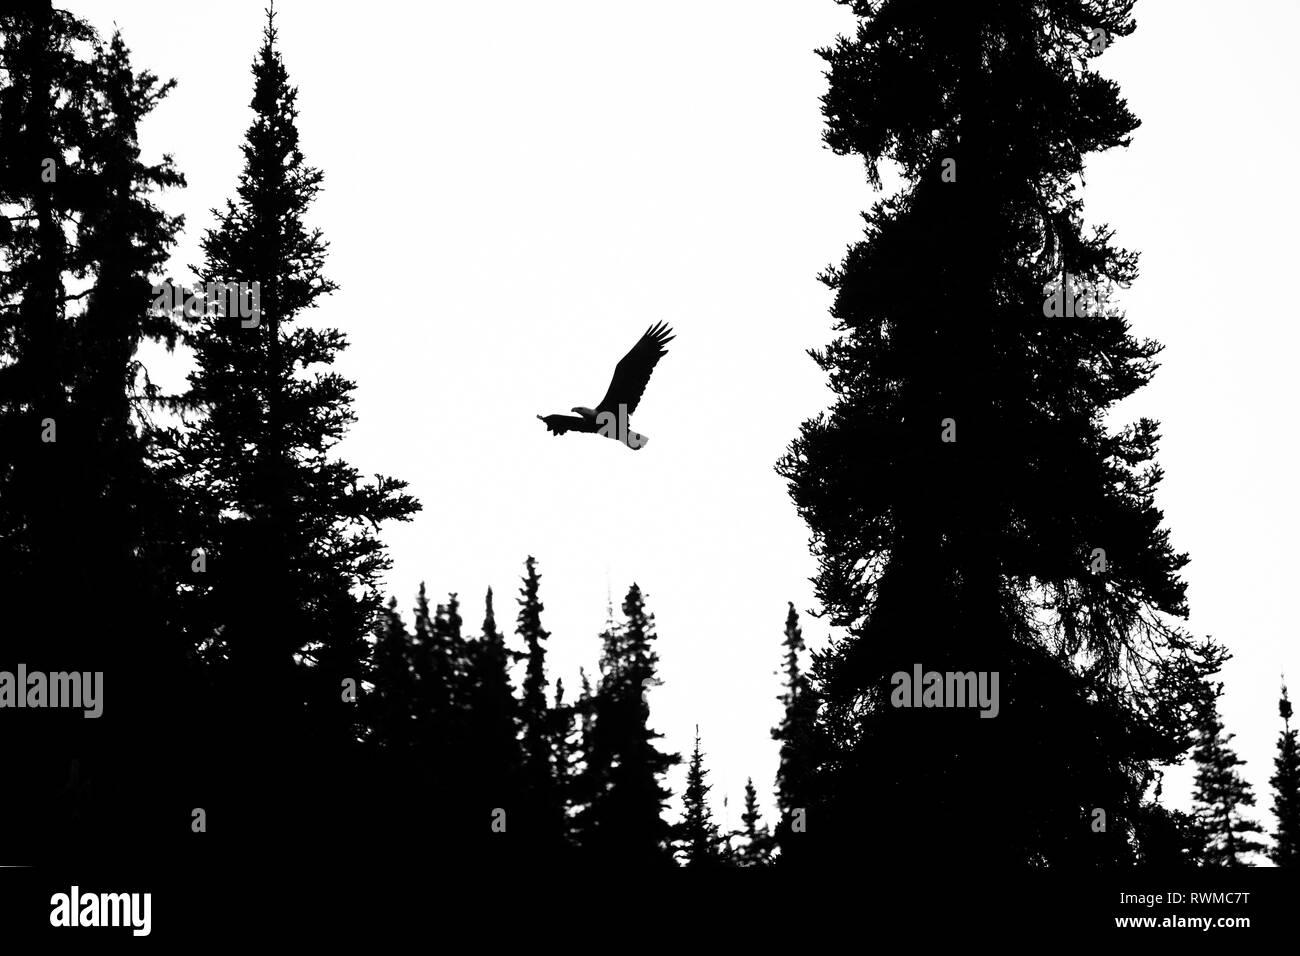 Silhouette of a Bald eagle (Haliaeetus leucocephalus) flying through the tree tops; Atlin, British Columbia, Canada - Stock Image